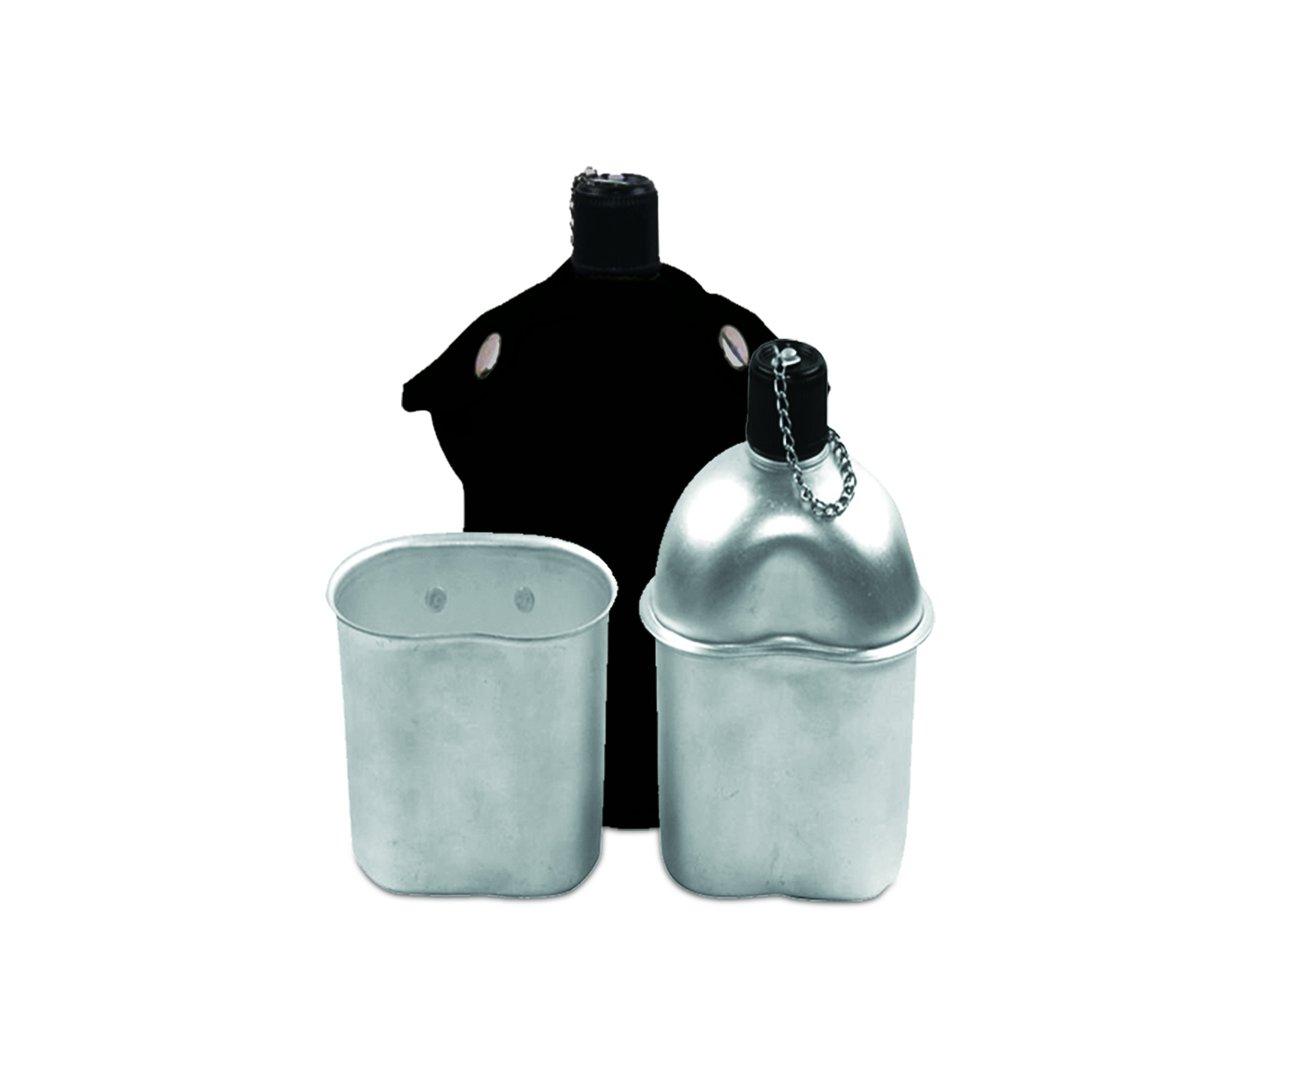 Cantil De Aluminio + Capa Preta + Copo De Aluminio - Echolife